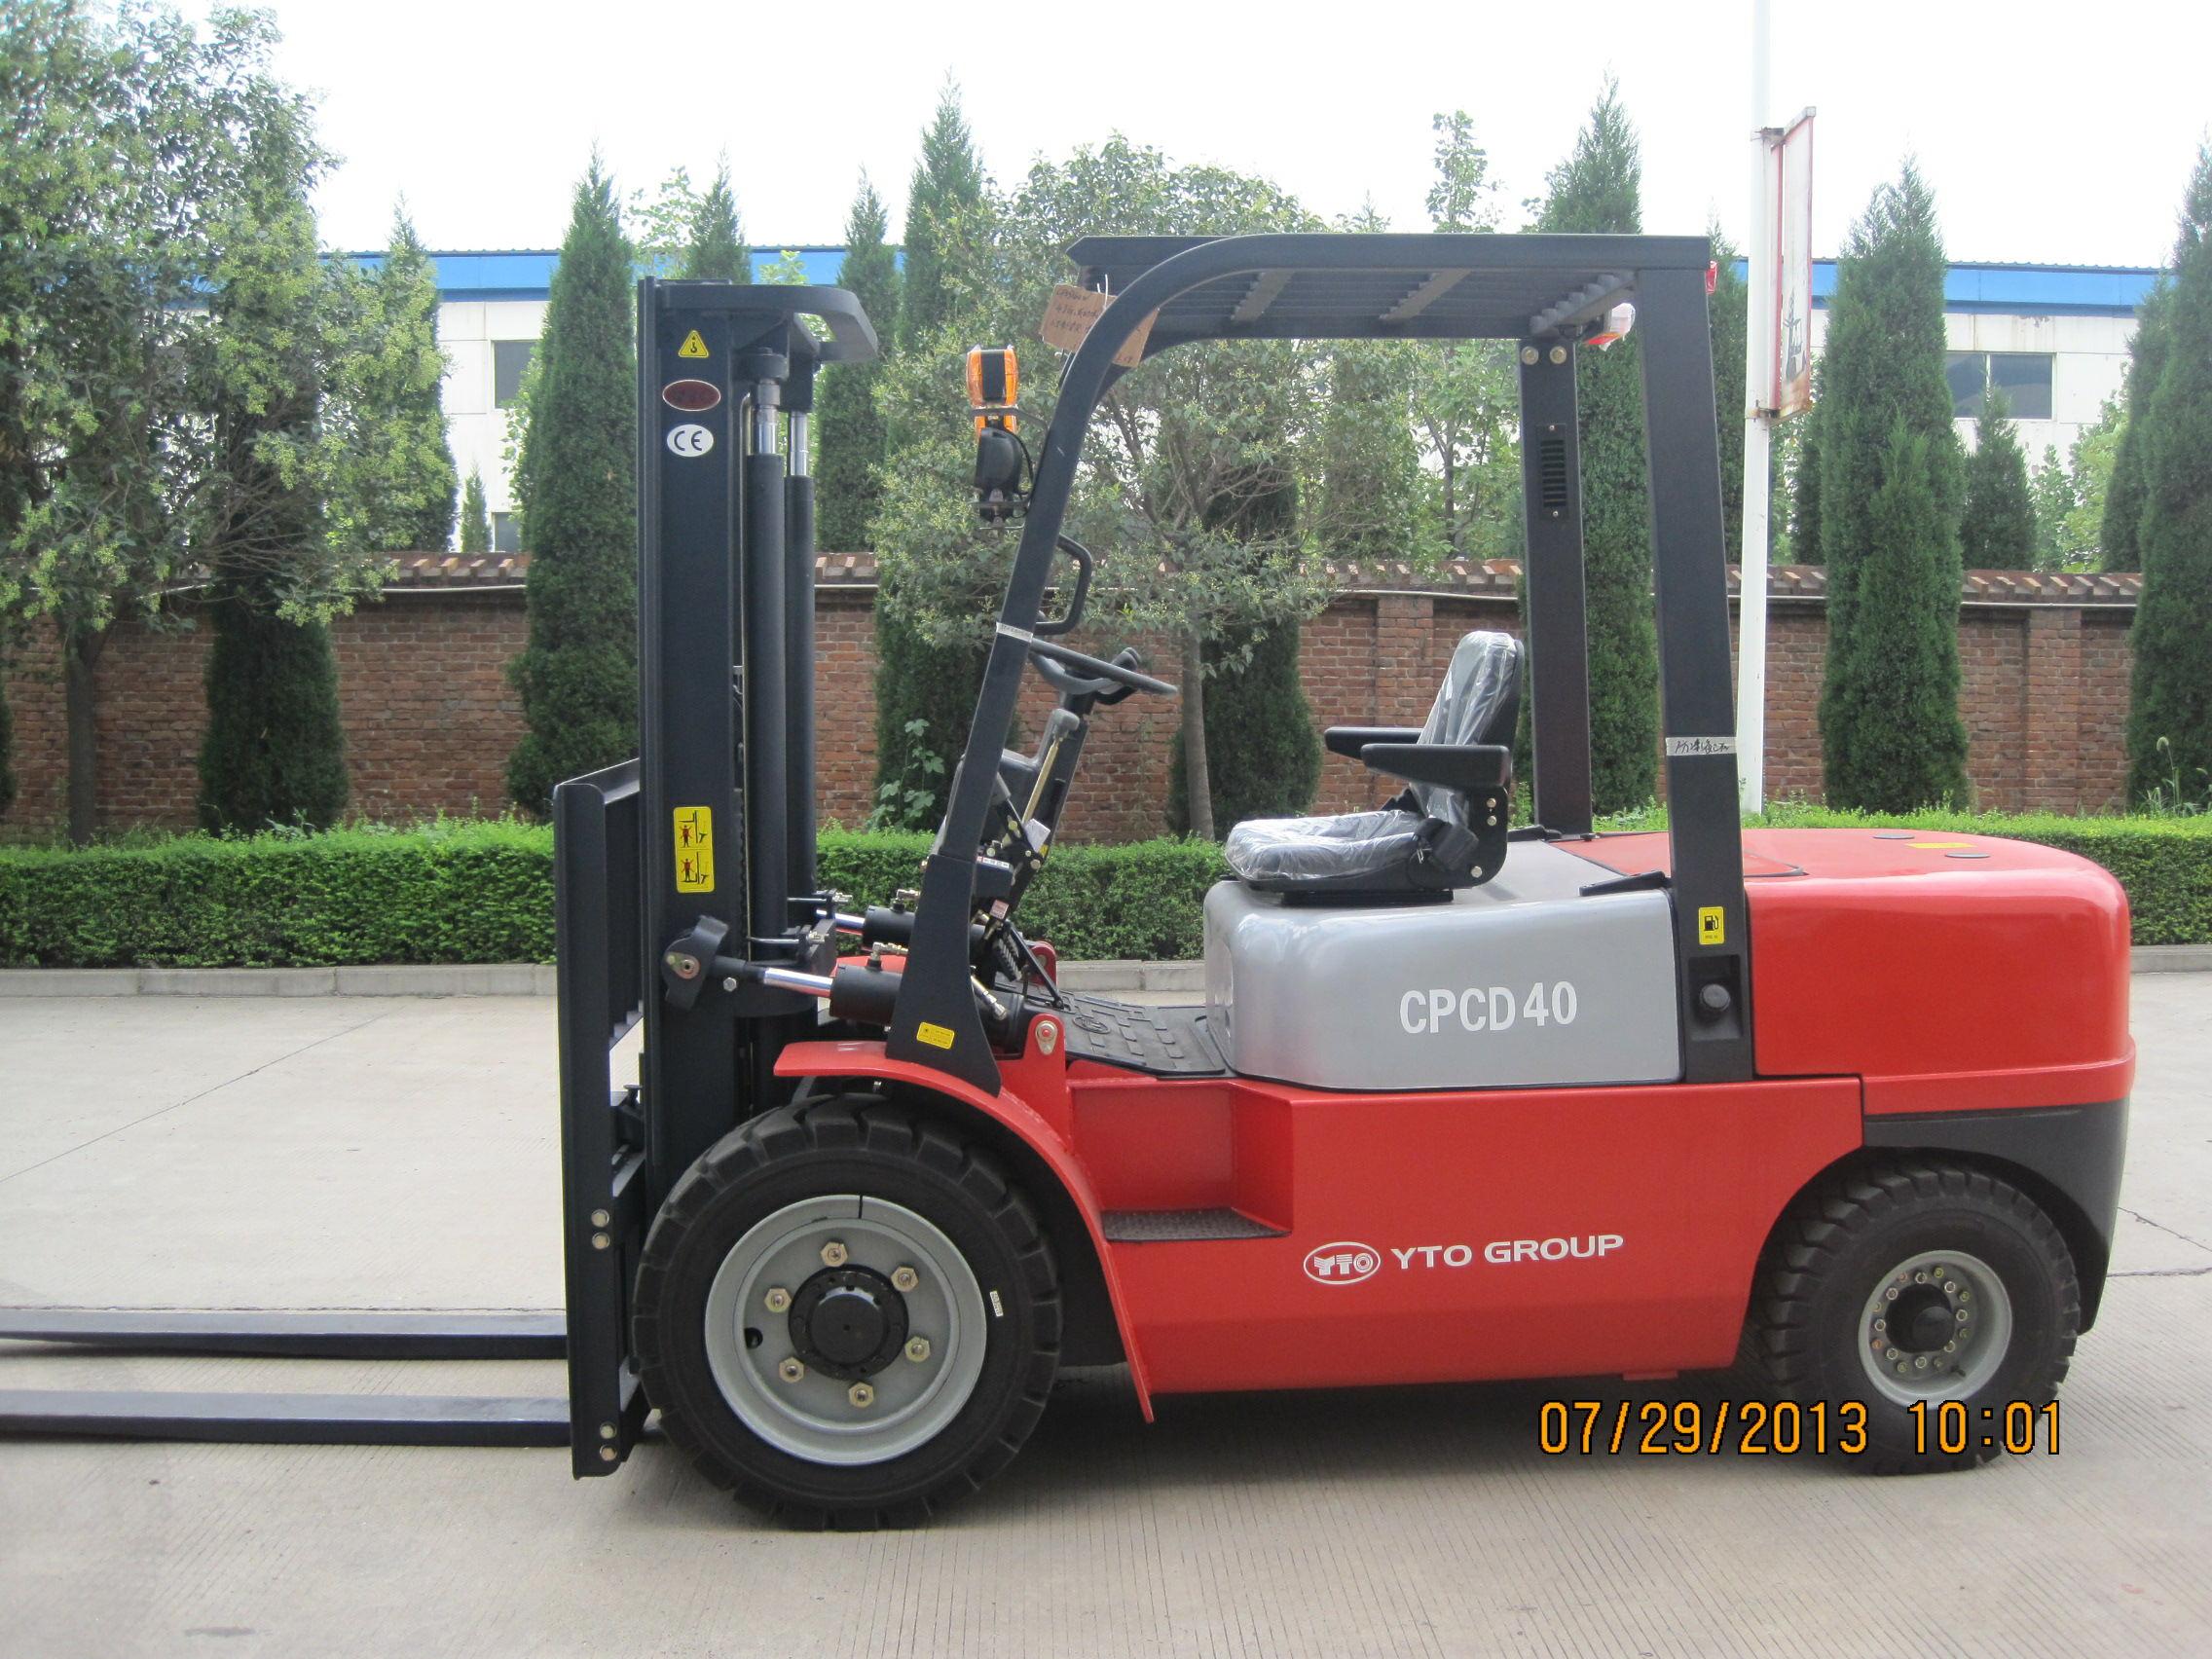 4 ton YTO diesel forklift CPCD40